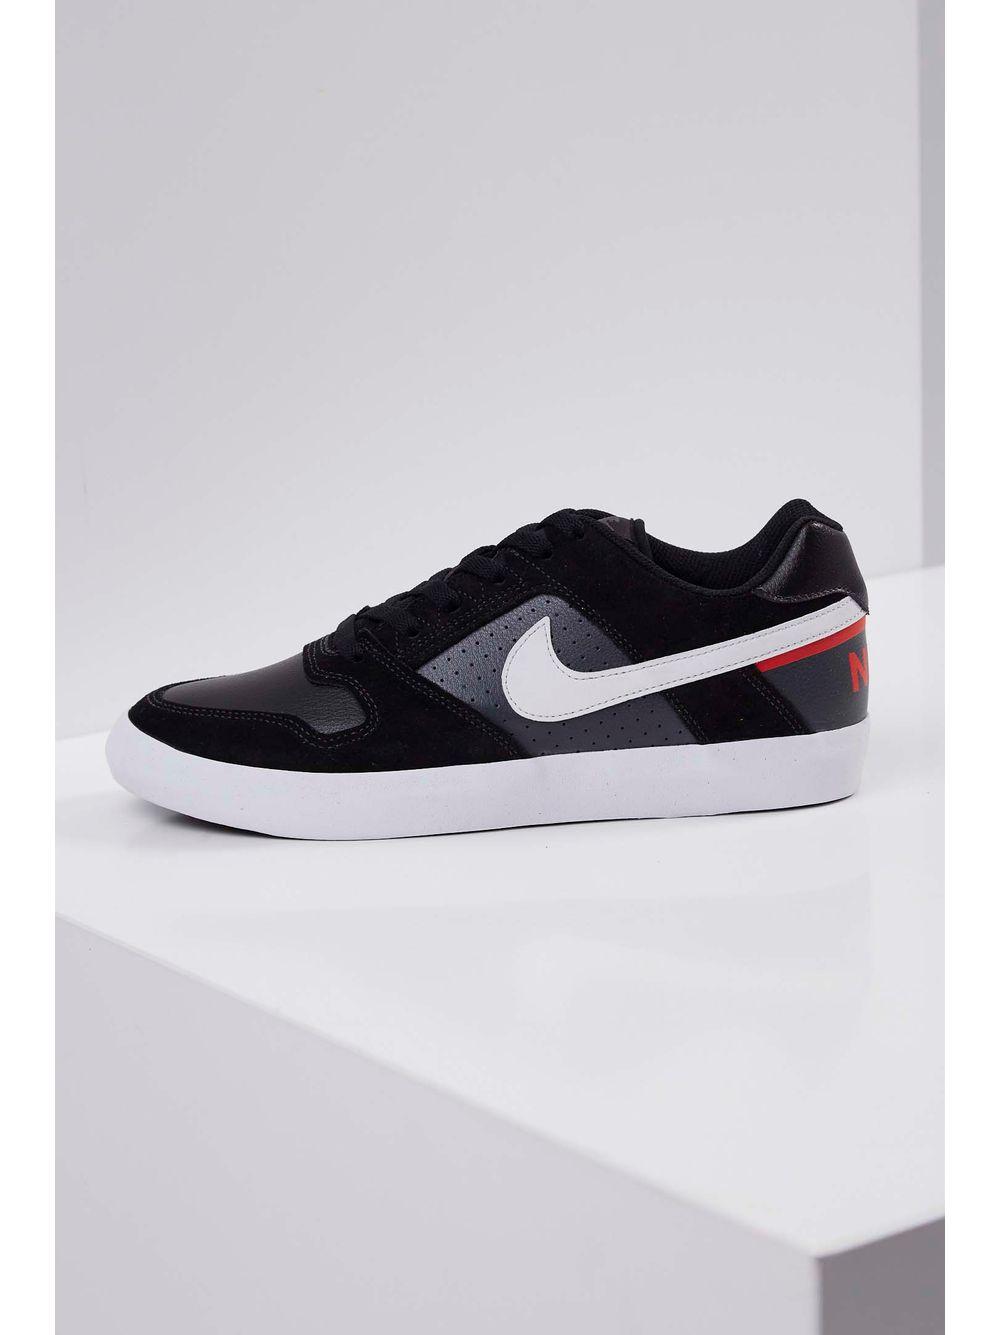 Tênis Skate Nike Force Vulc Preto - pittol d3daf76b534